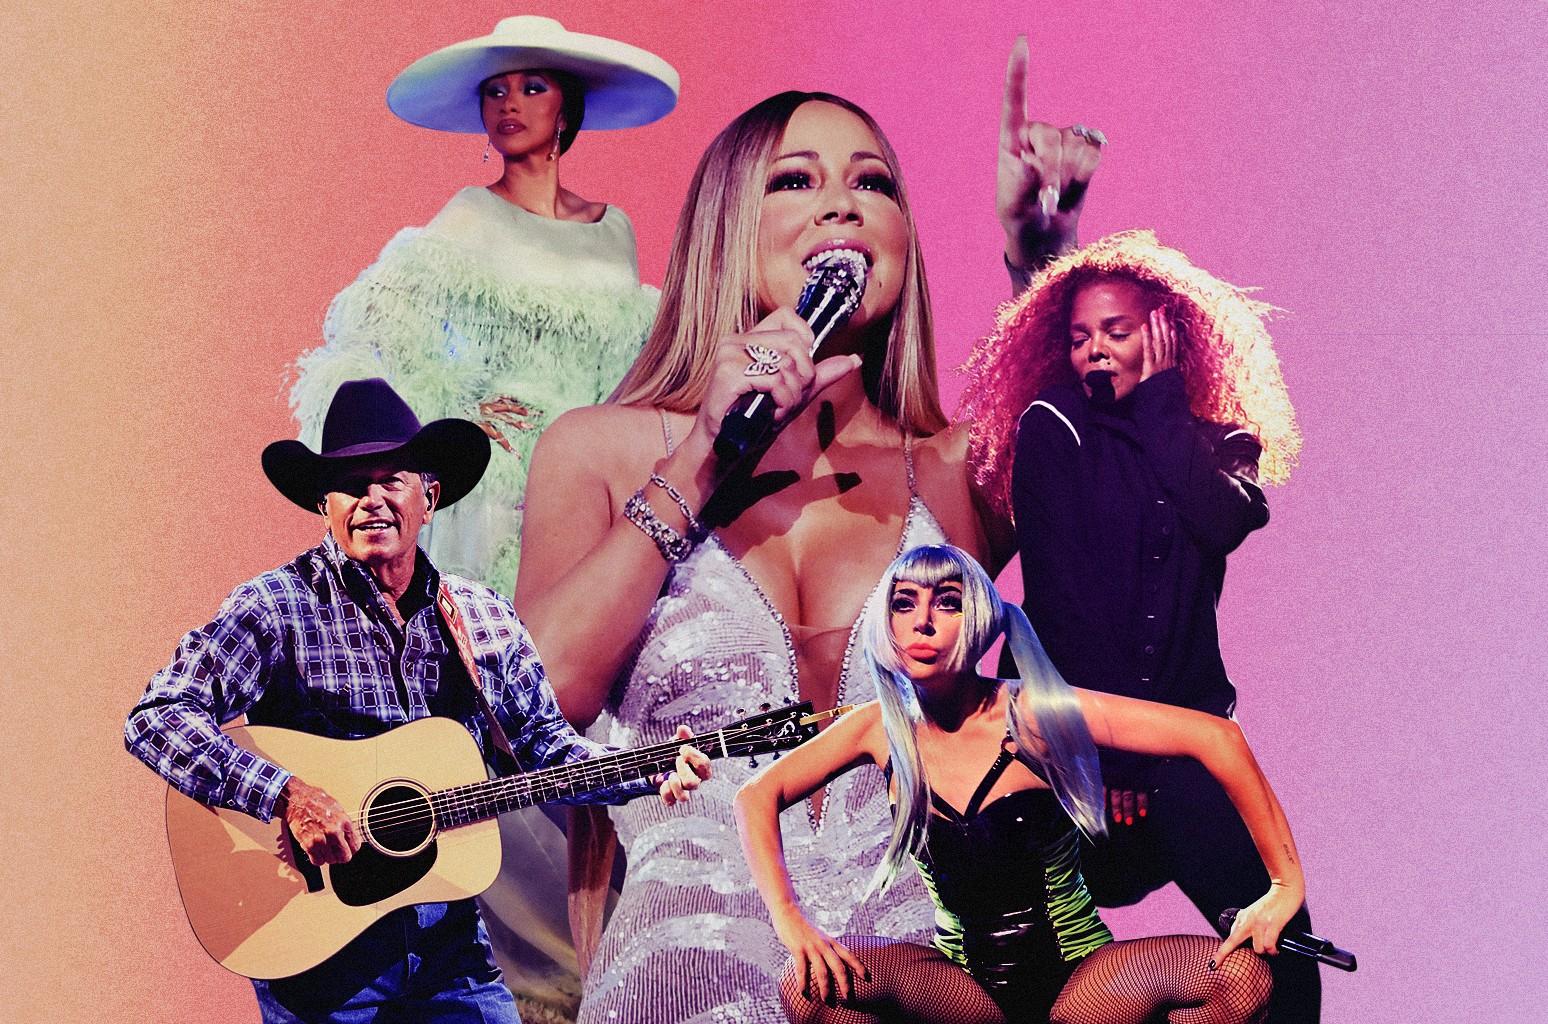 Clockwise from top left: Cardi B, Mariah Carey, Janet Jackson, Lady Gaga and George Strait